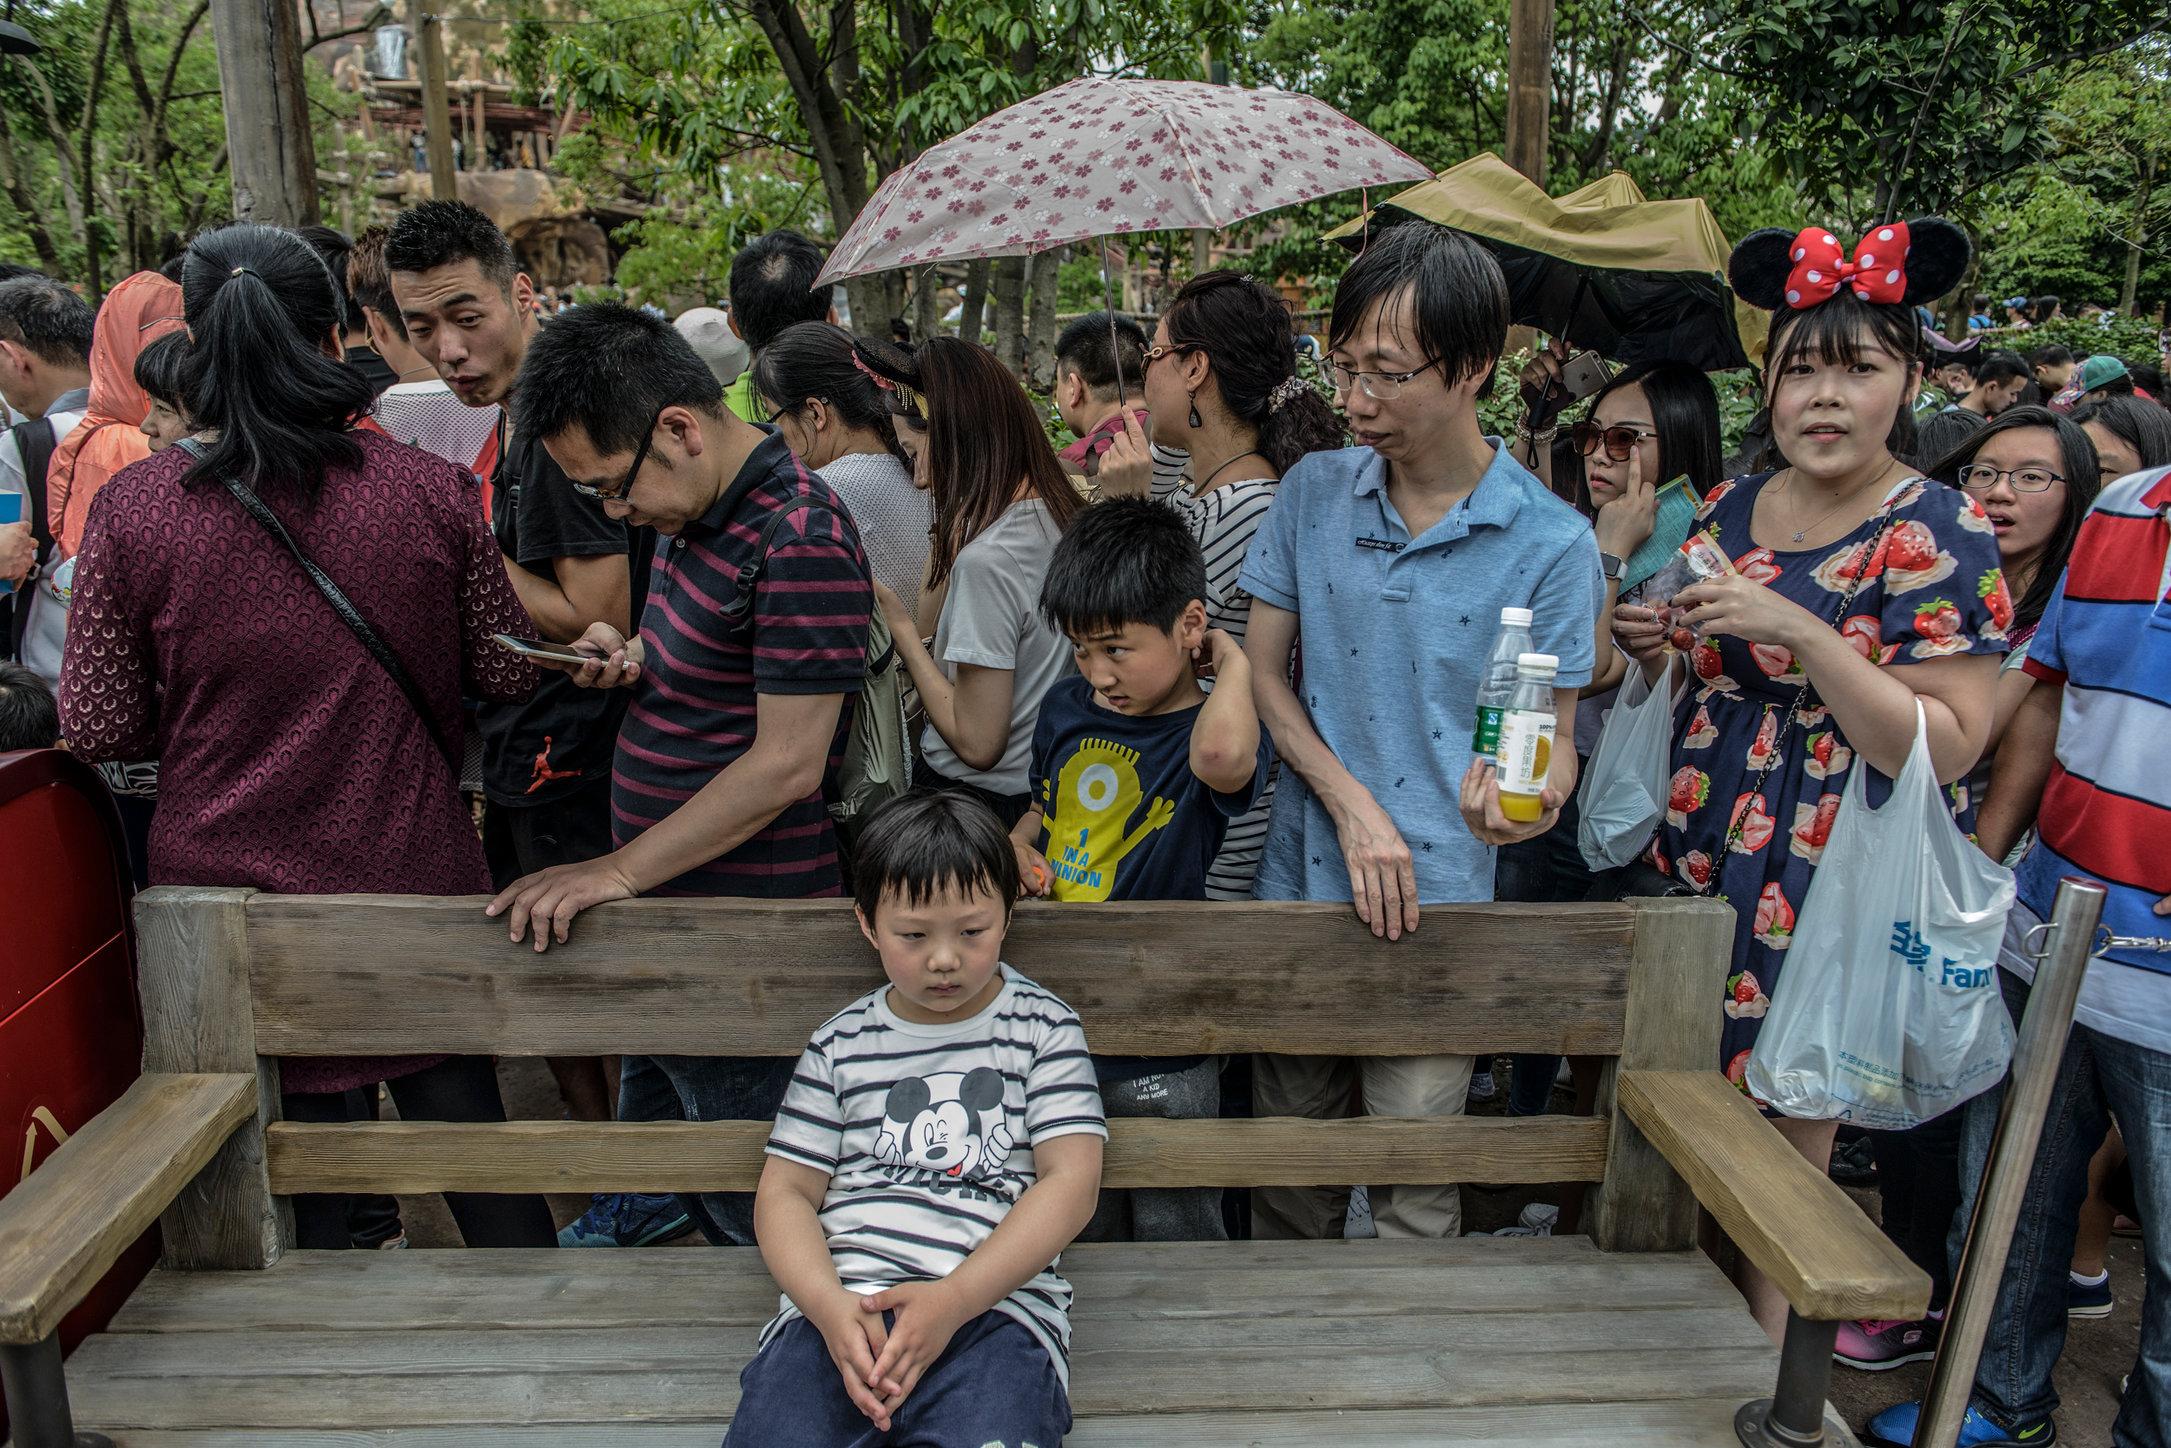 DisneylandShanghai0017.jpg